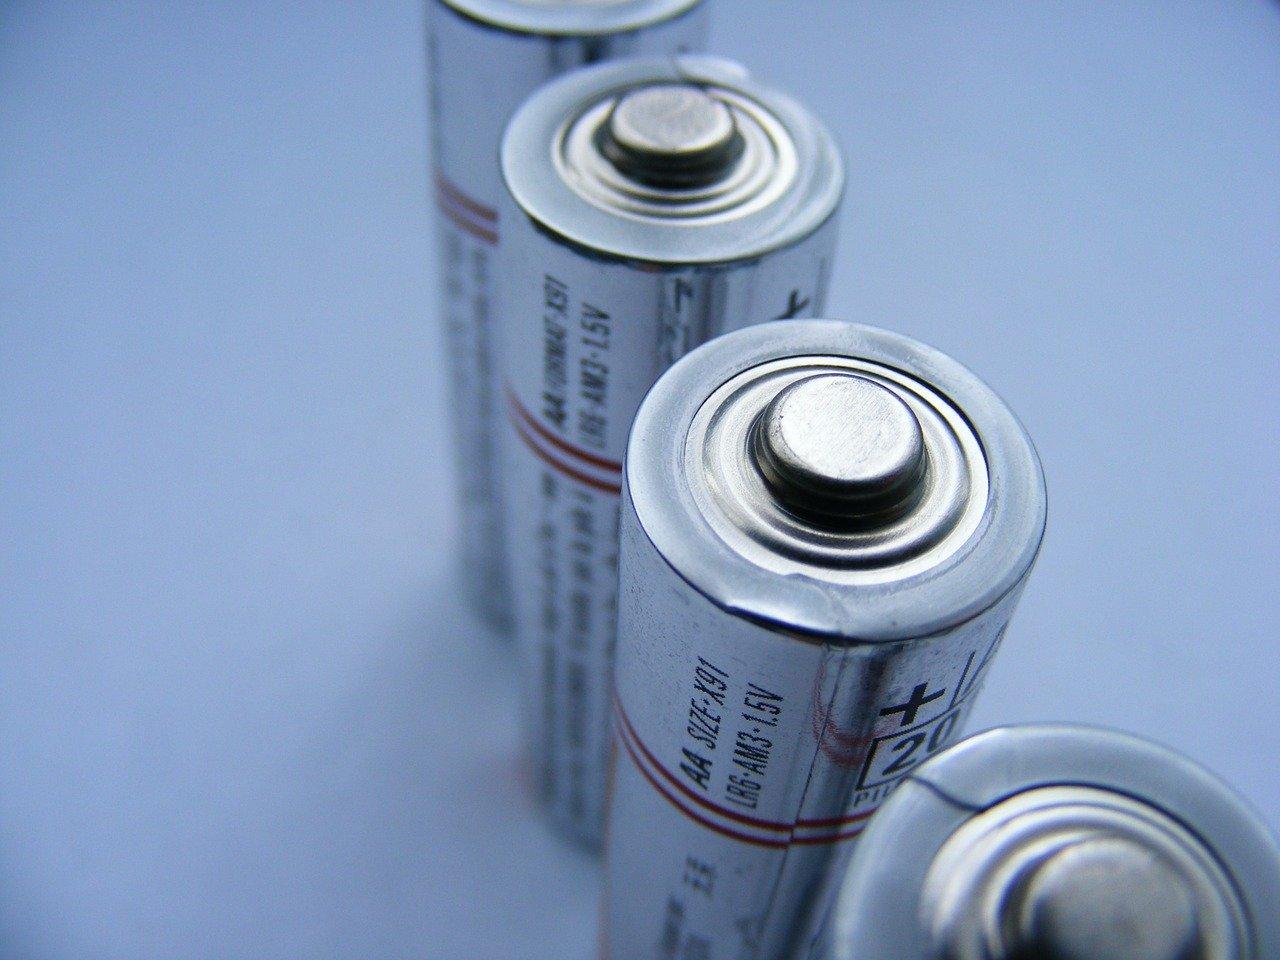 batterie zinco-aria